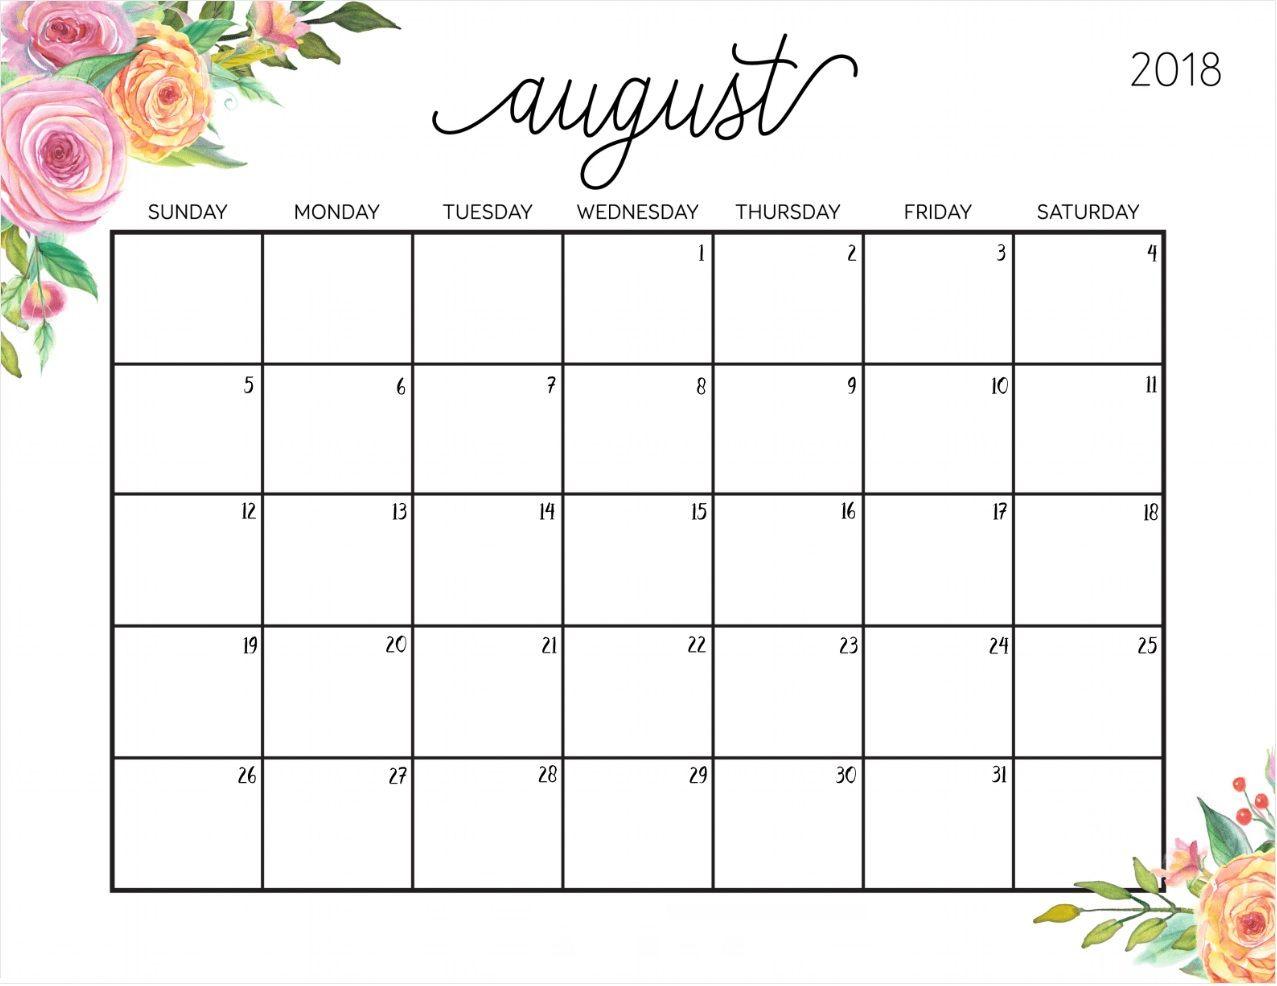 Pinkirstin Palasz On Calendars | December Calendar, Printable inside Cute August Monthly Calendar Template Printable